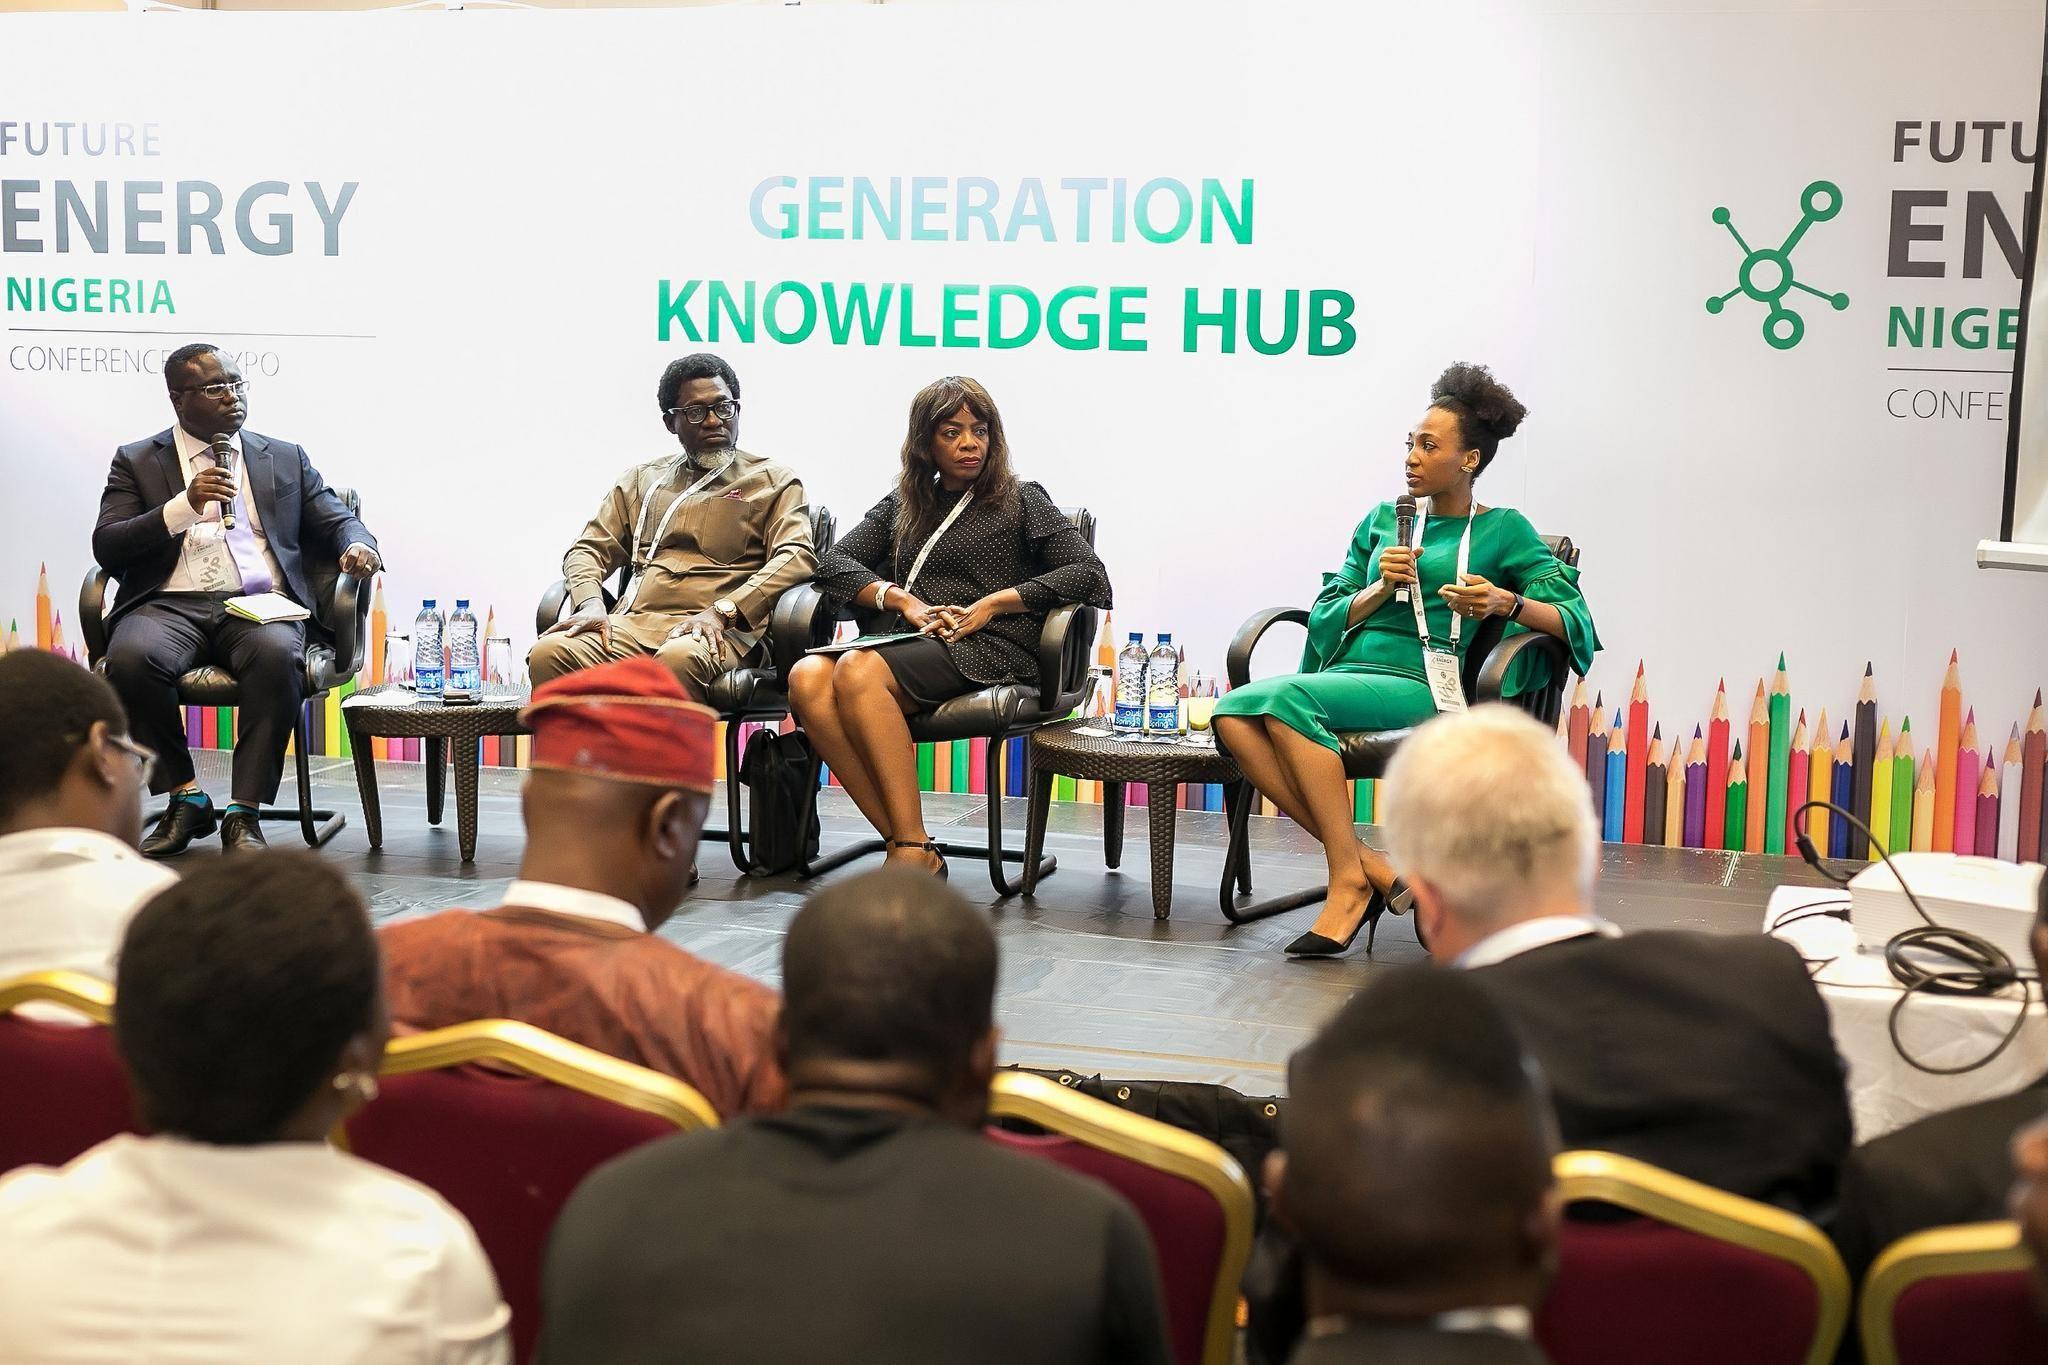 Free Knowledge Hub Seminars